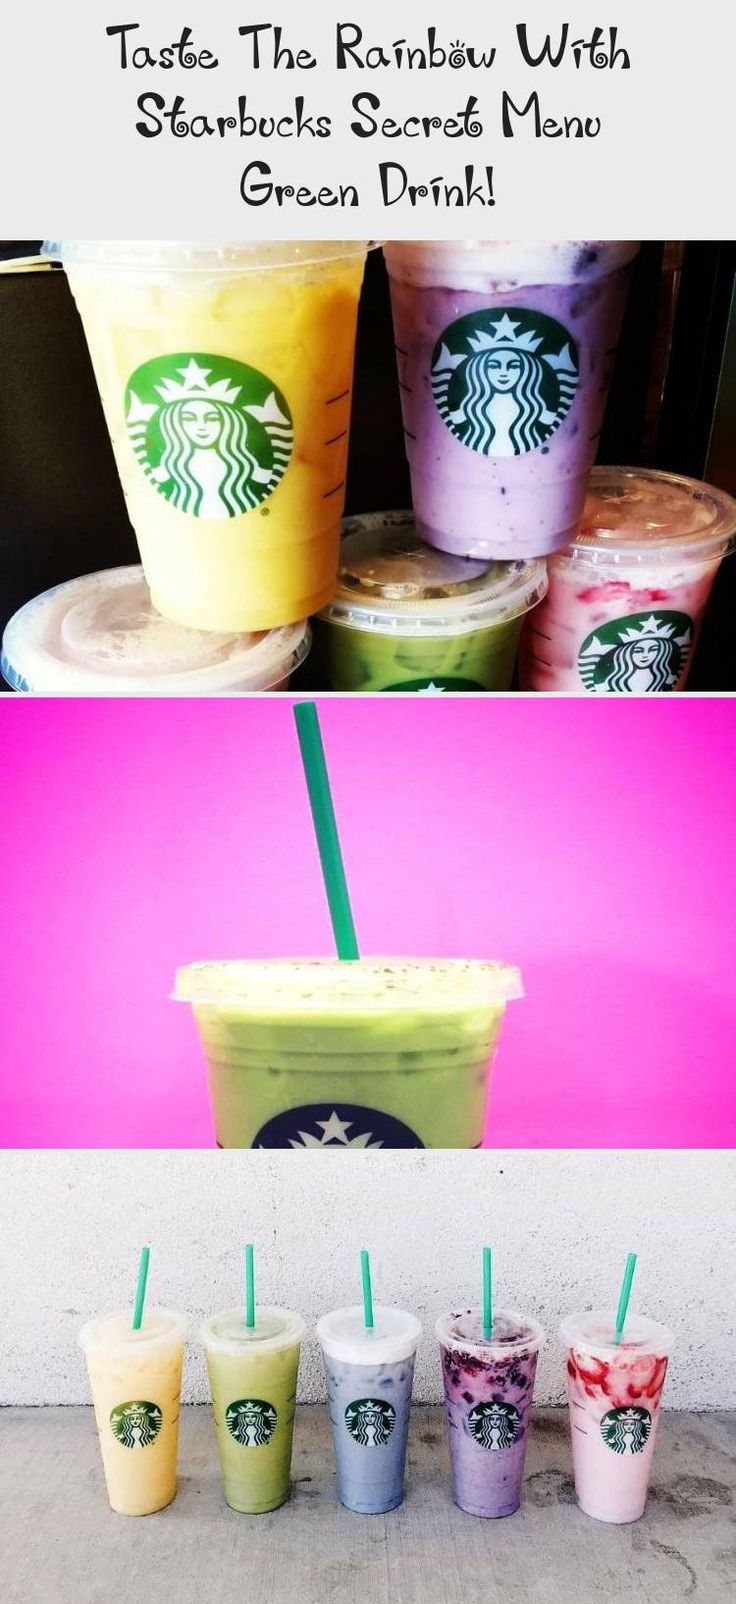 Taste The Rainbow With Starbucks Secret Menu Green Drink